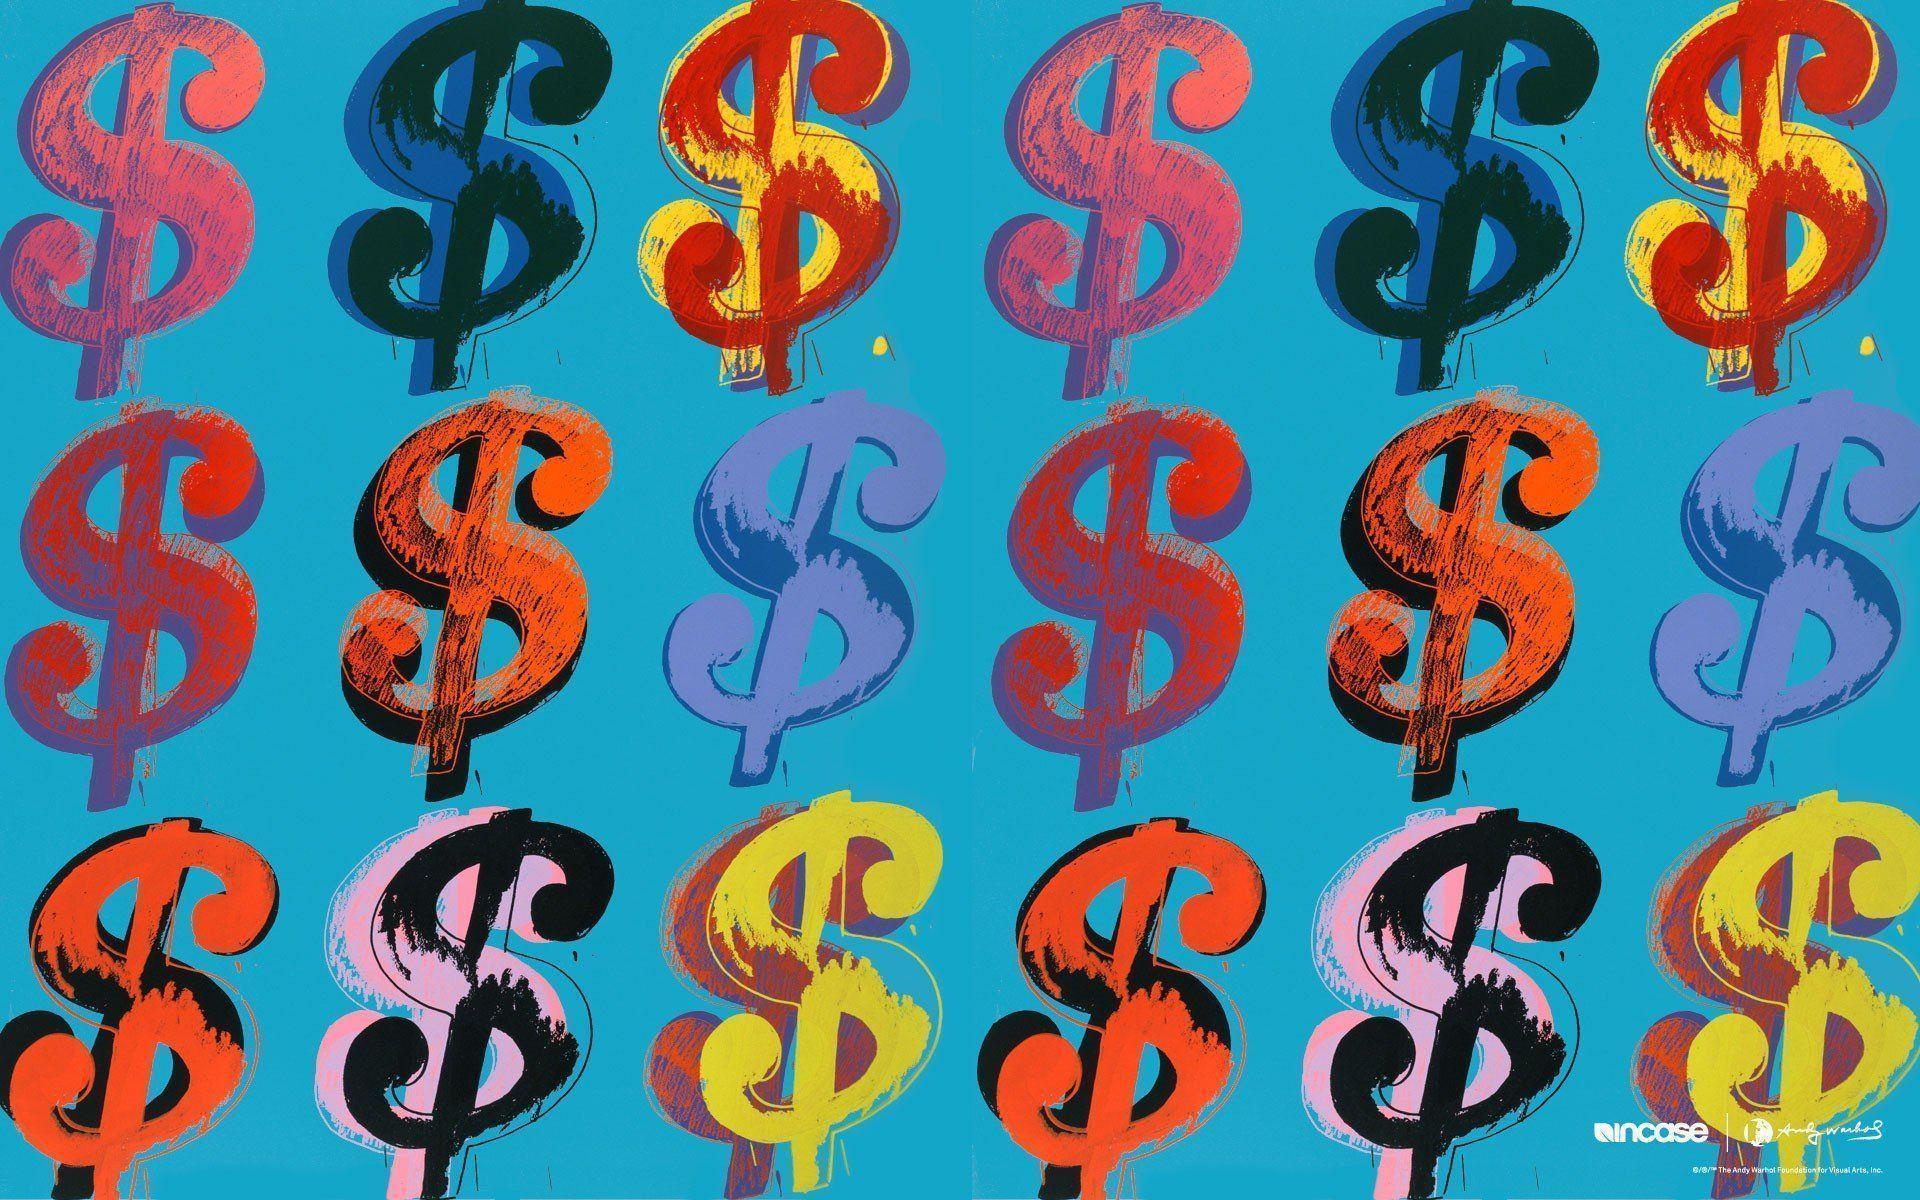 Andy Warhol Incase wallpaper | 1920x1200 | 212788 | WallpaperUP